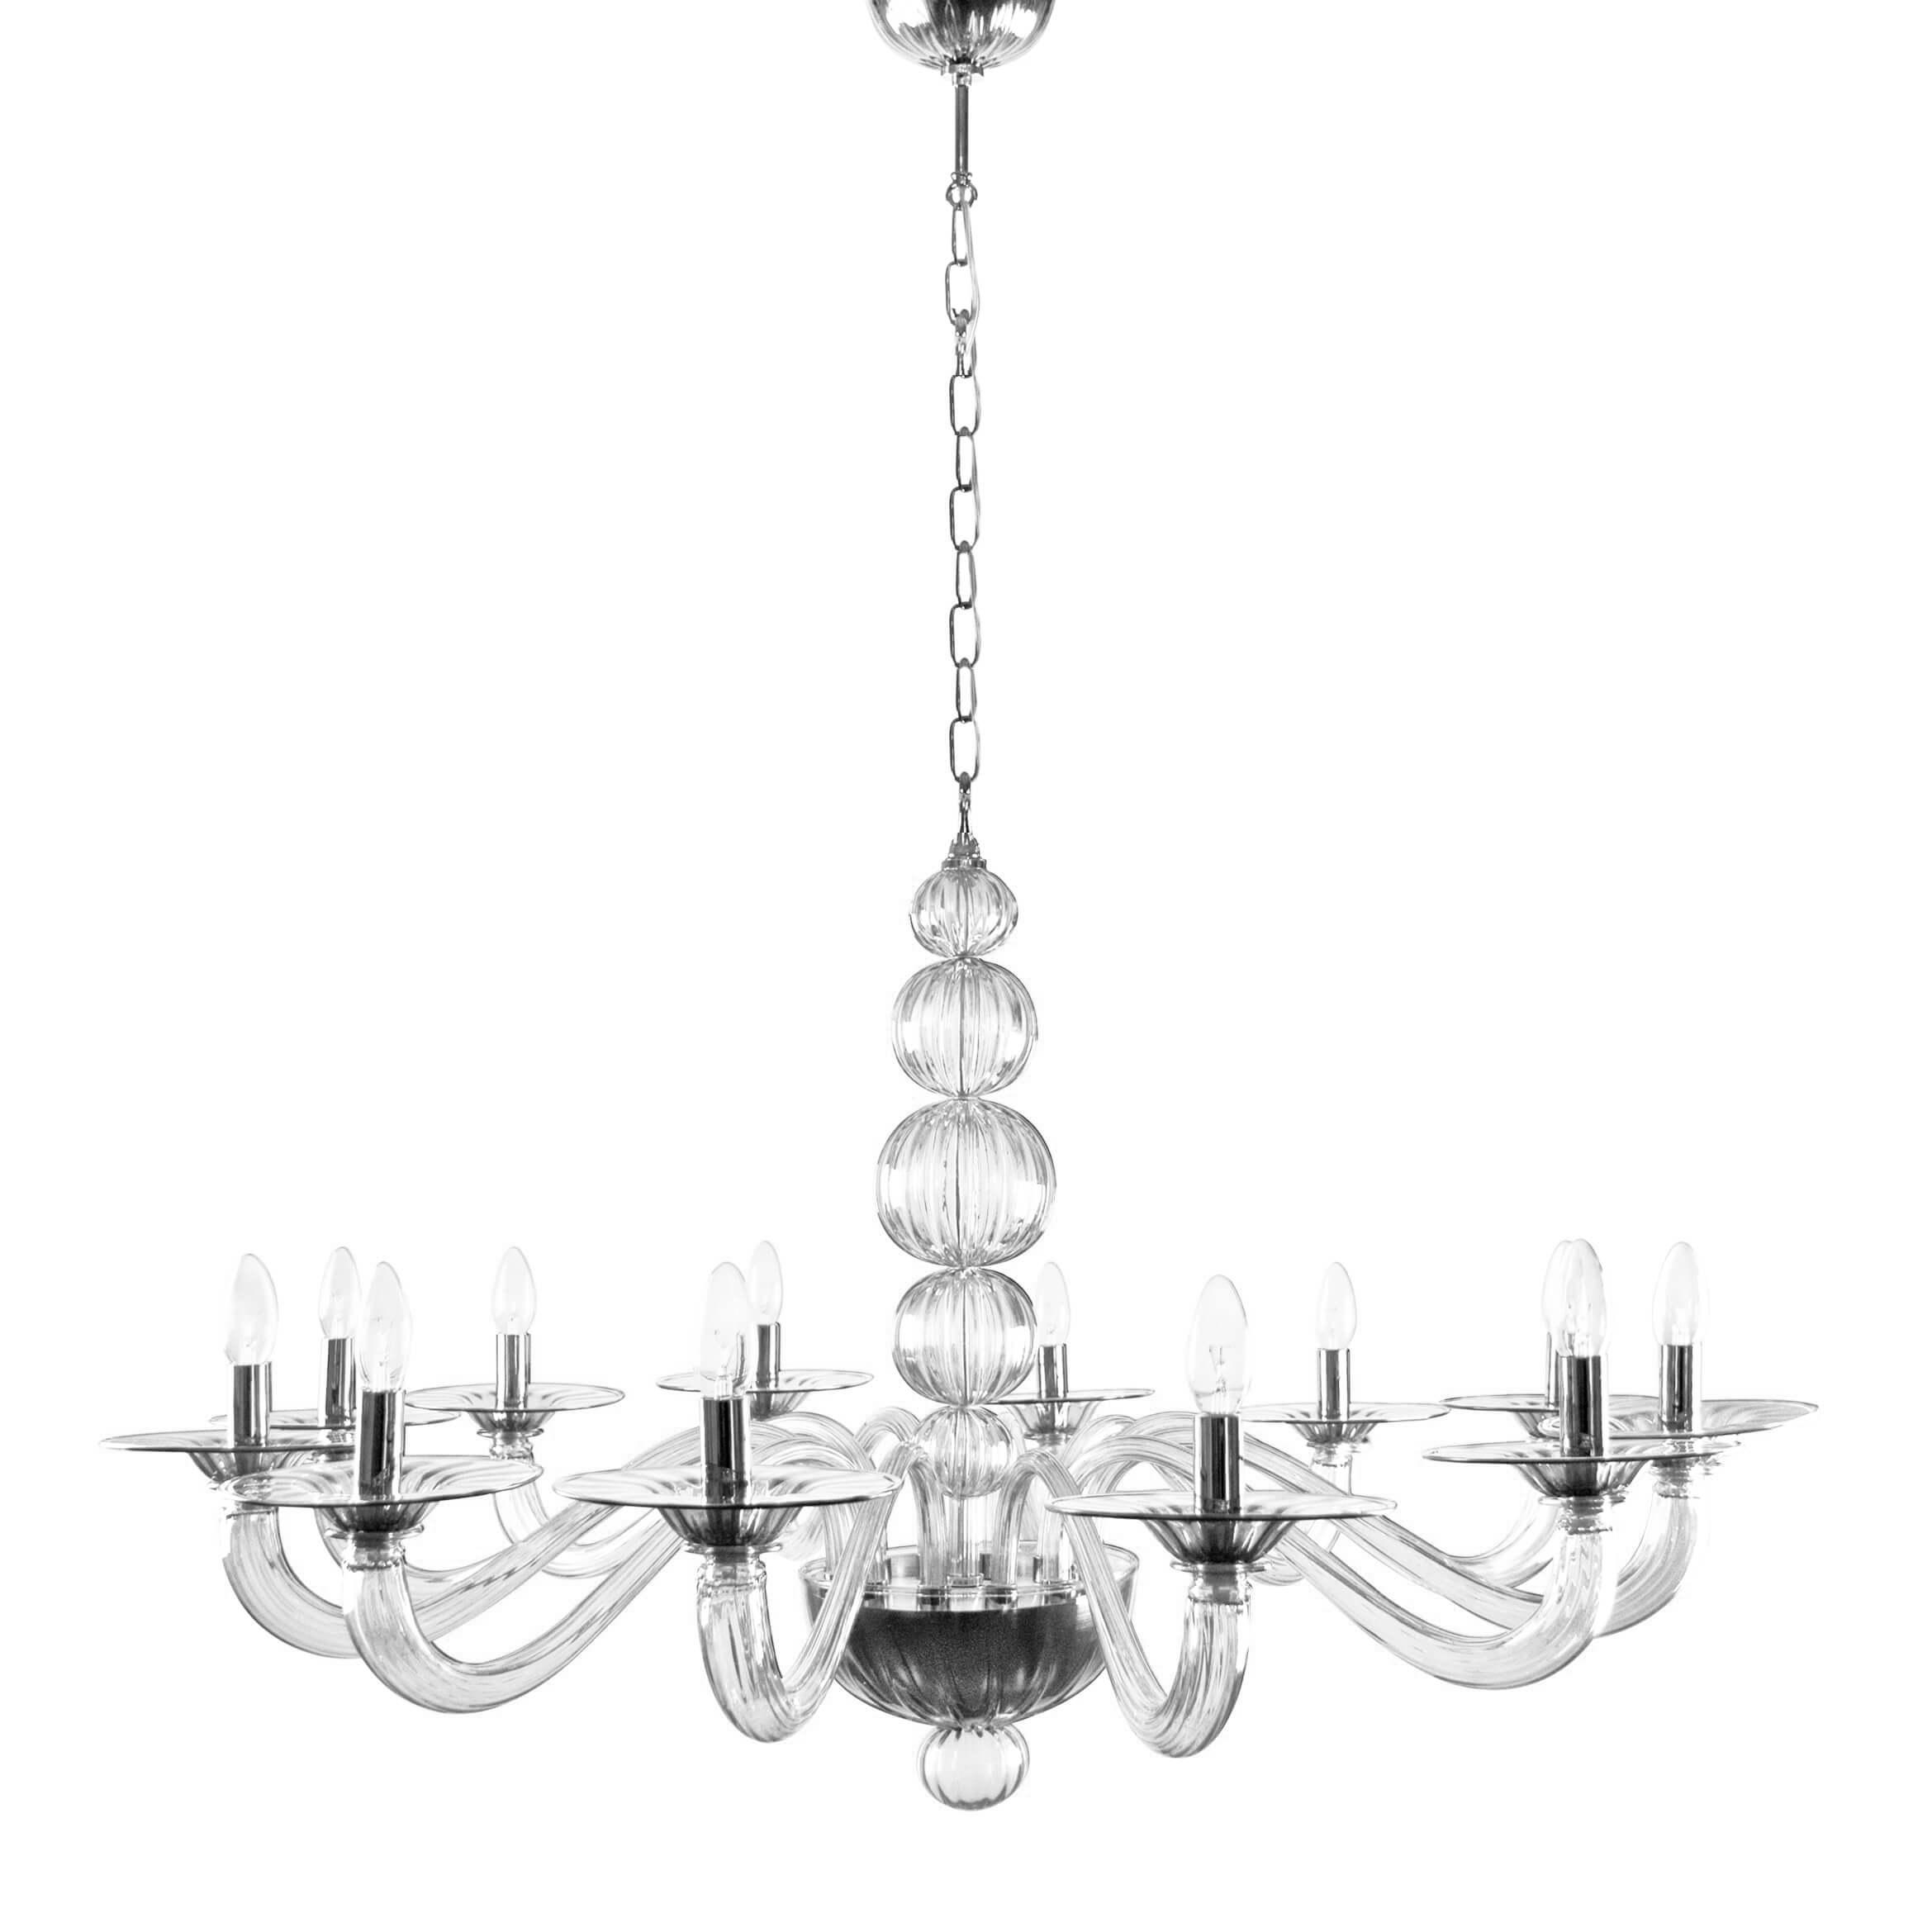 Joya villaverde london villaverde london joya murano chandelier square clear arubaitofo Gallery